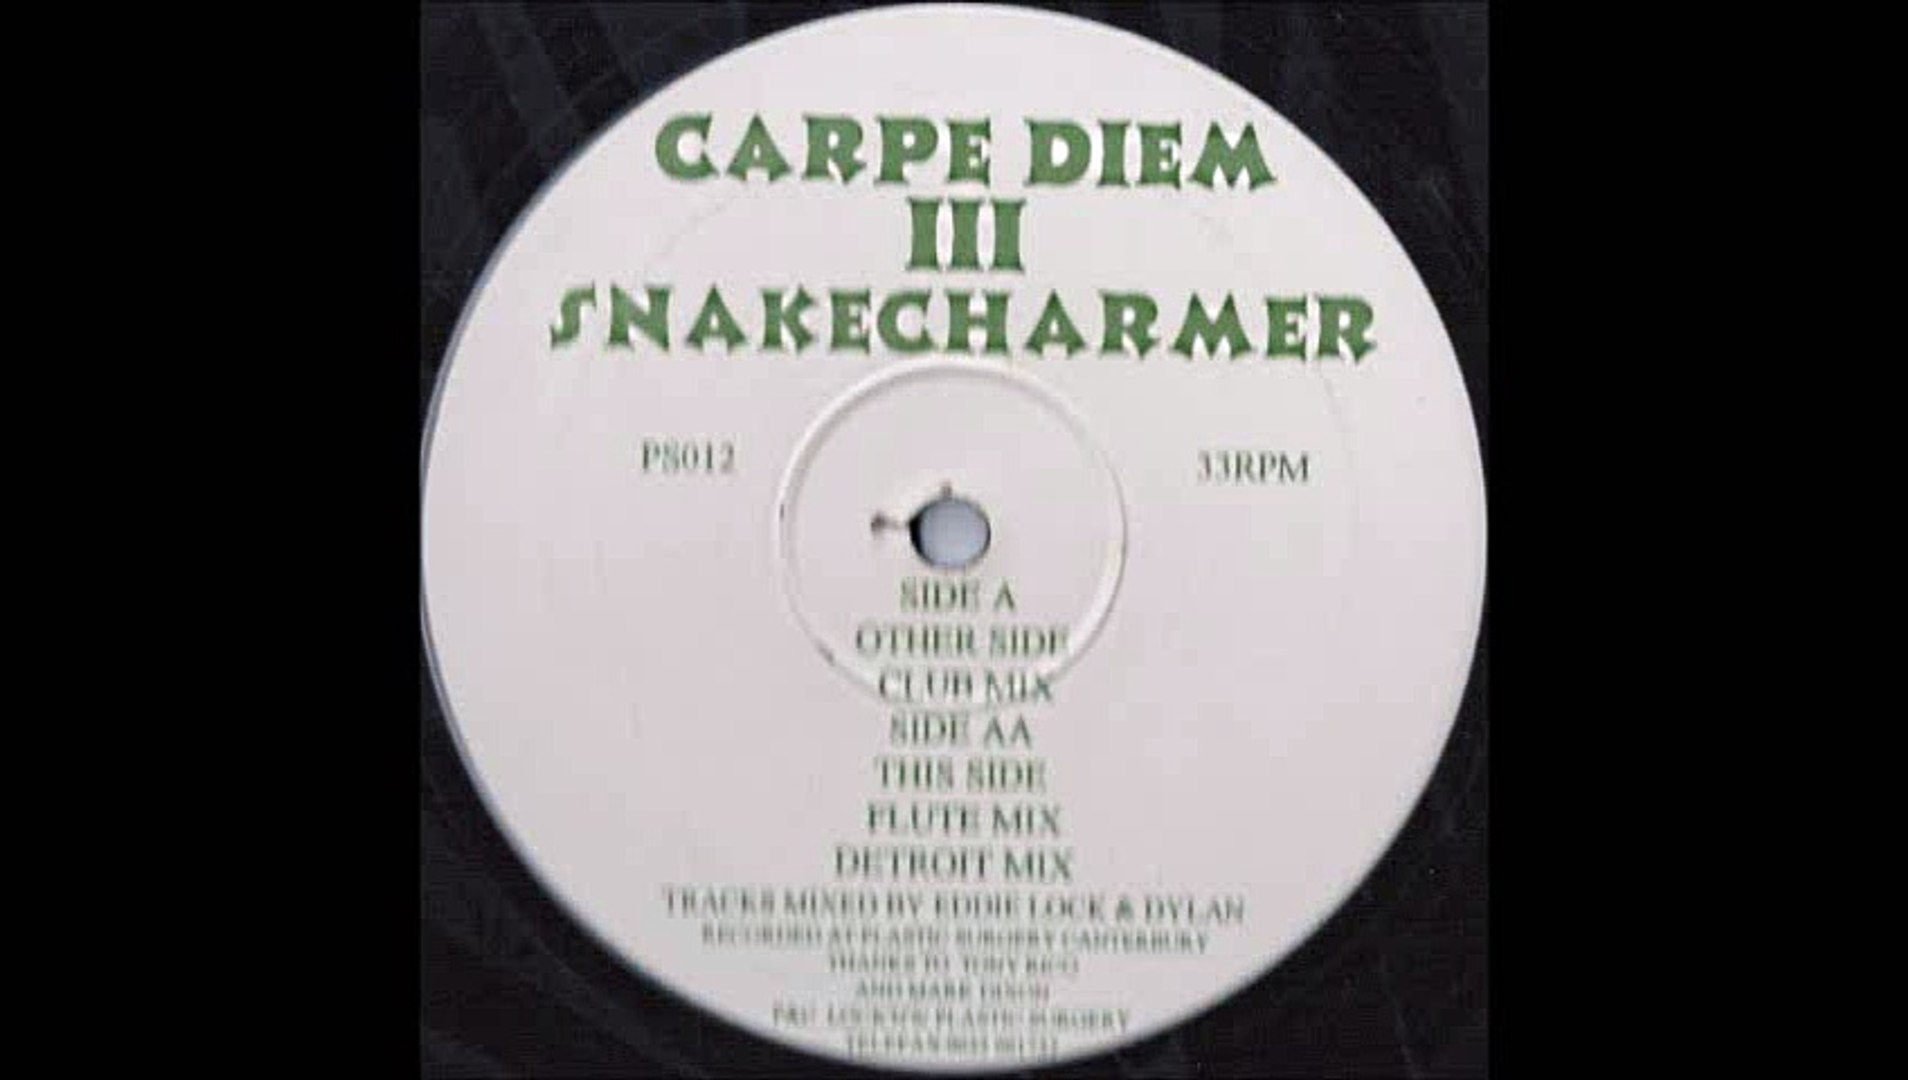 Carpe Diem III - Snakecharmer (Club Mix) (A)